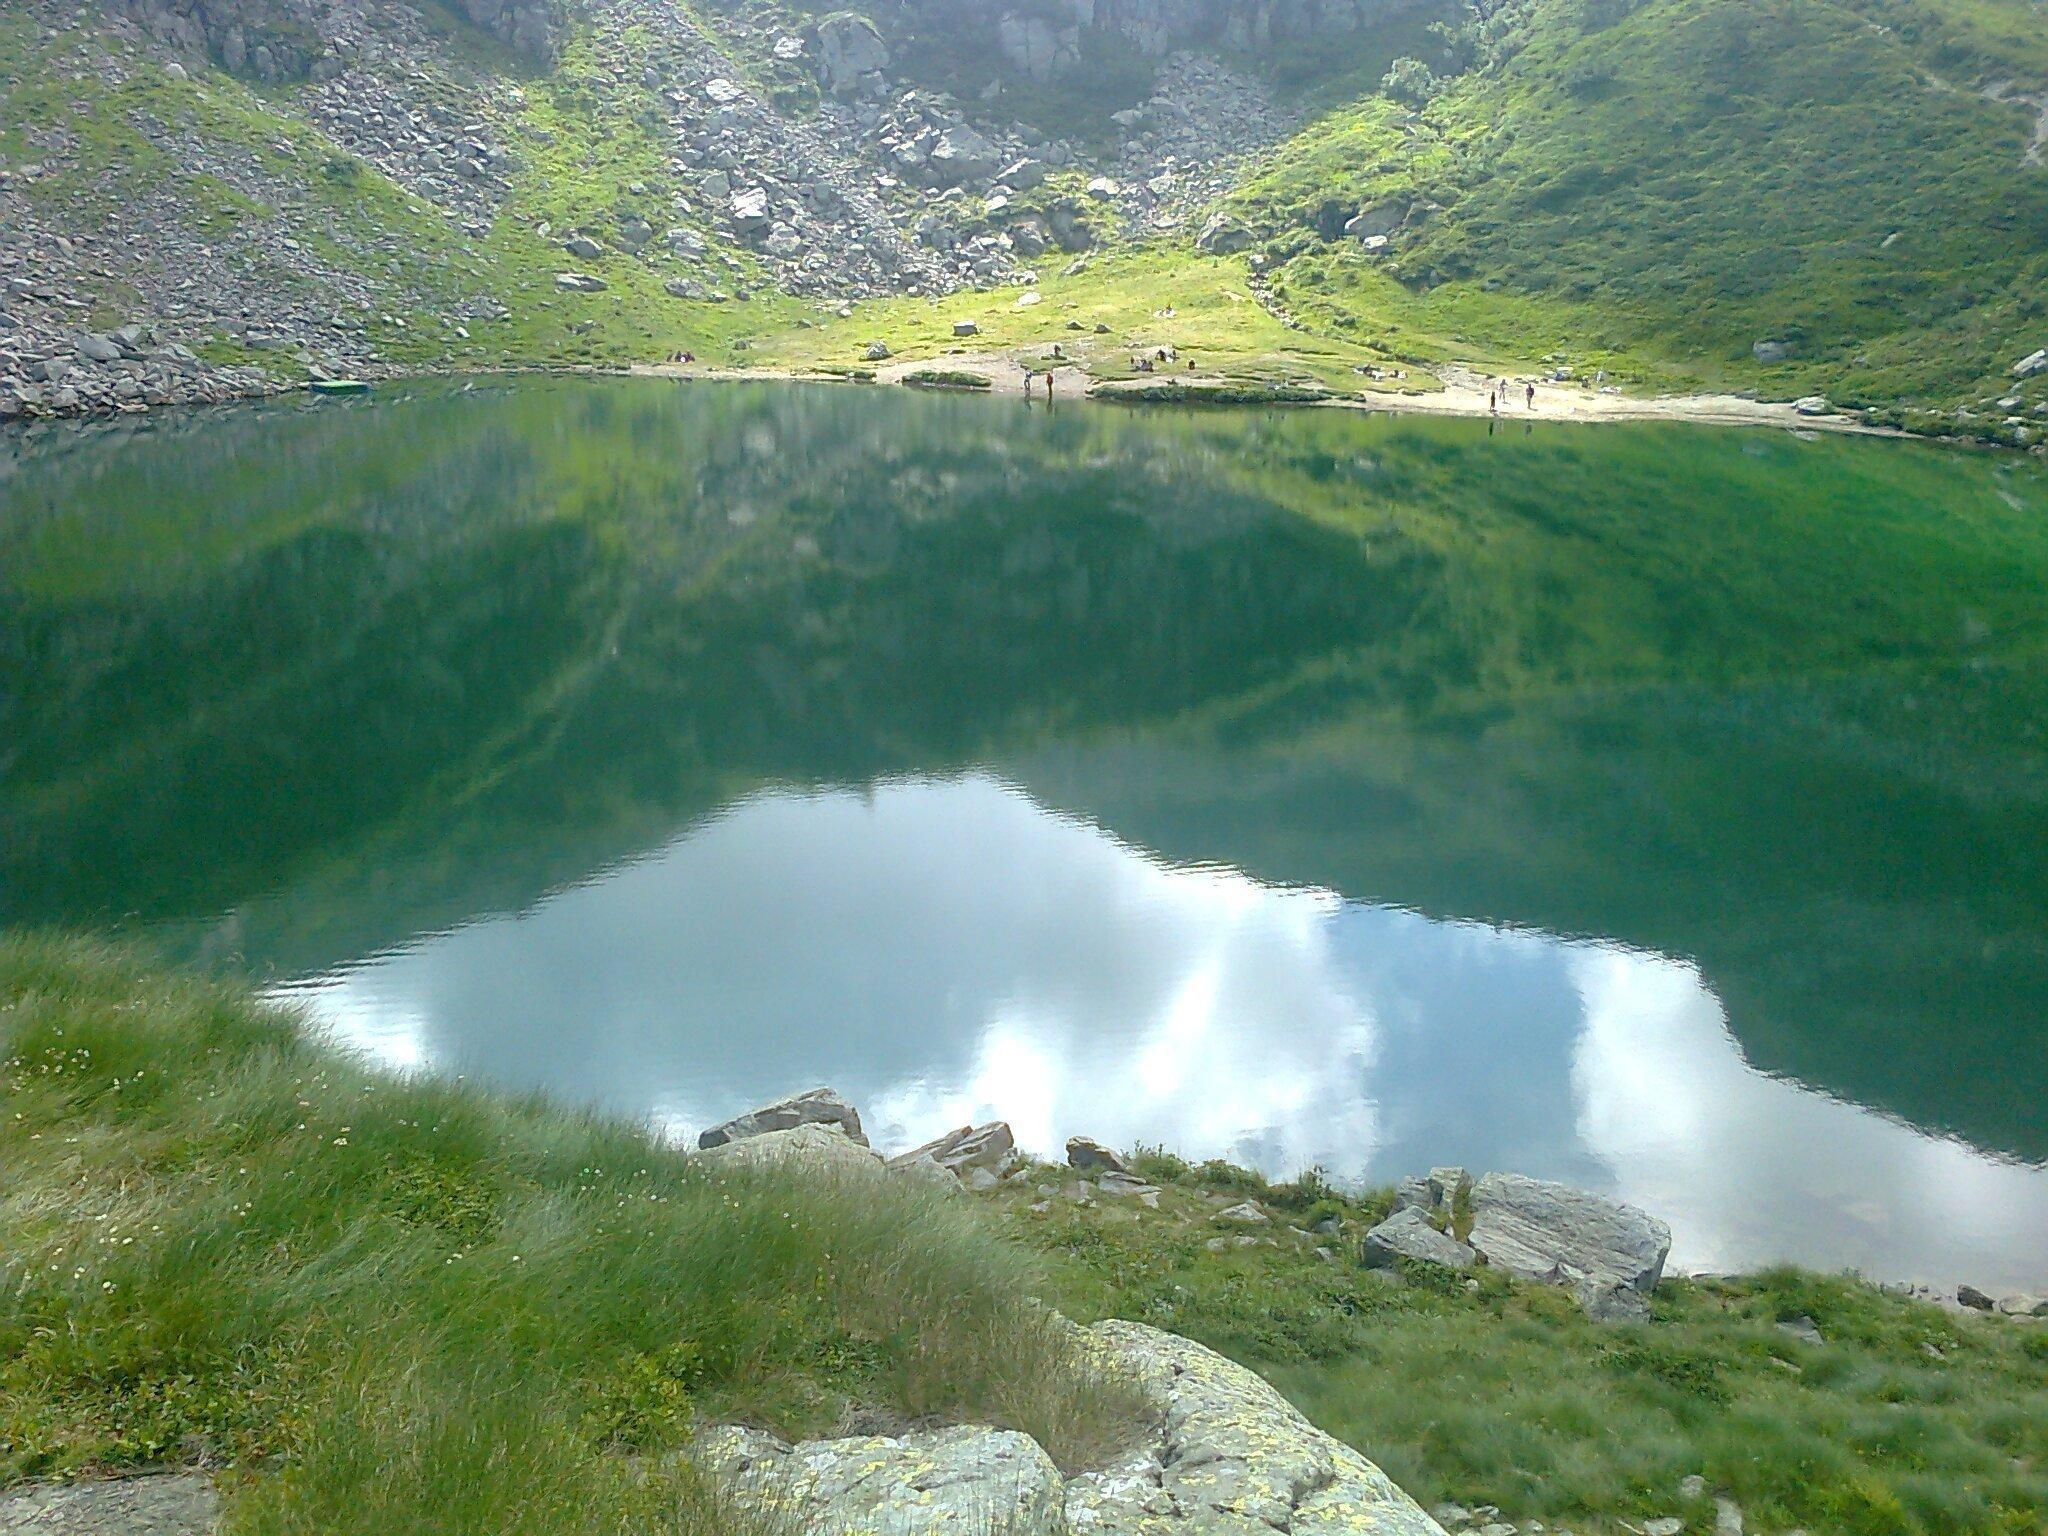 a lake in the mountains 12 1440x1080 - A lake in the mountains